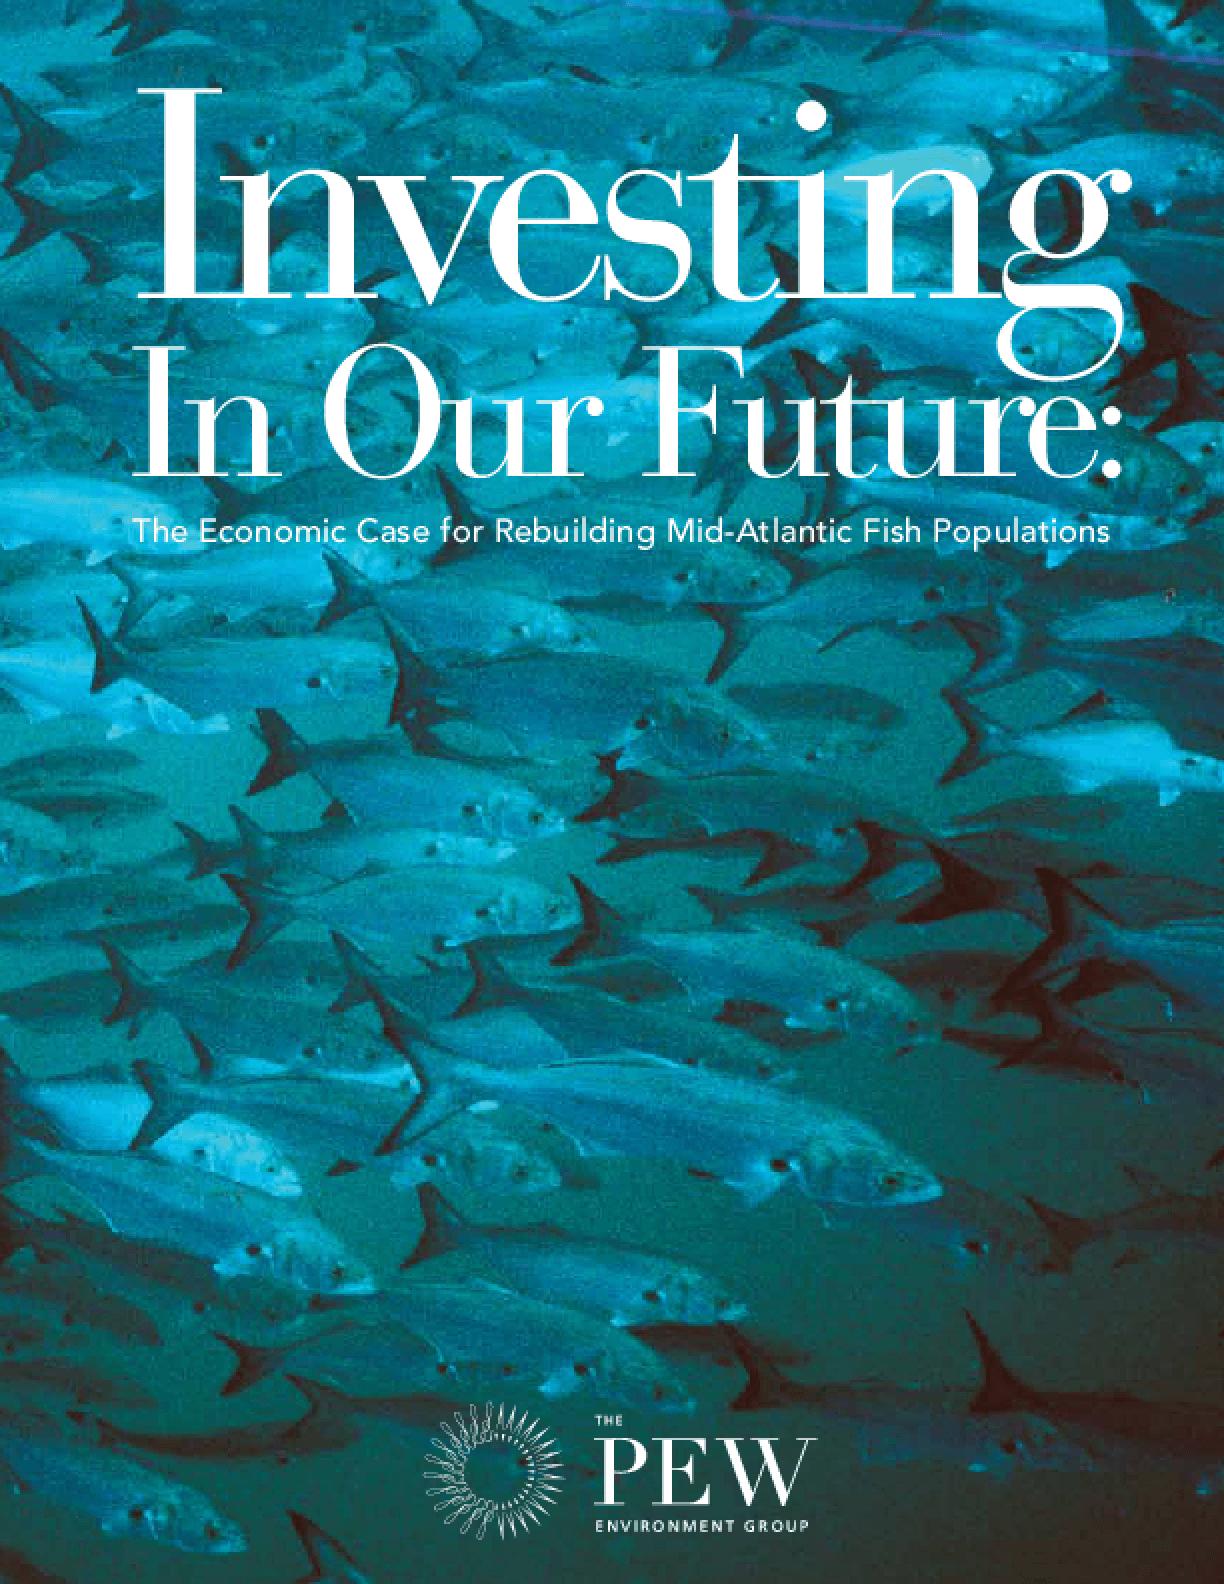 Investing in Our Future: The Economic Case for Rebuilding Mid-Atlantic Fish Populations